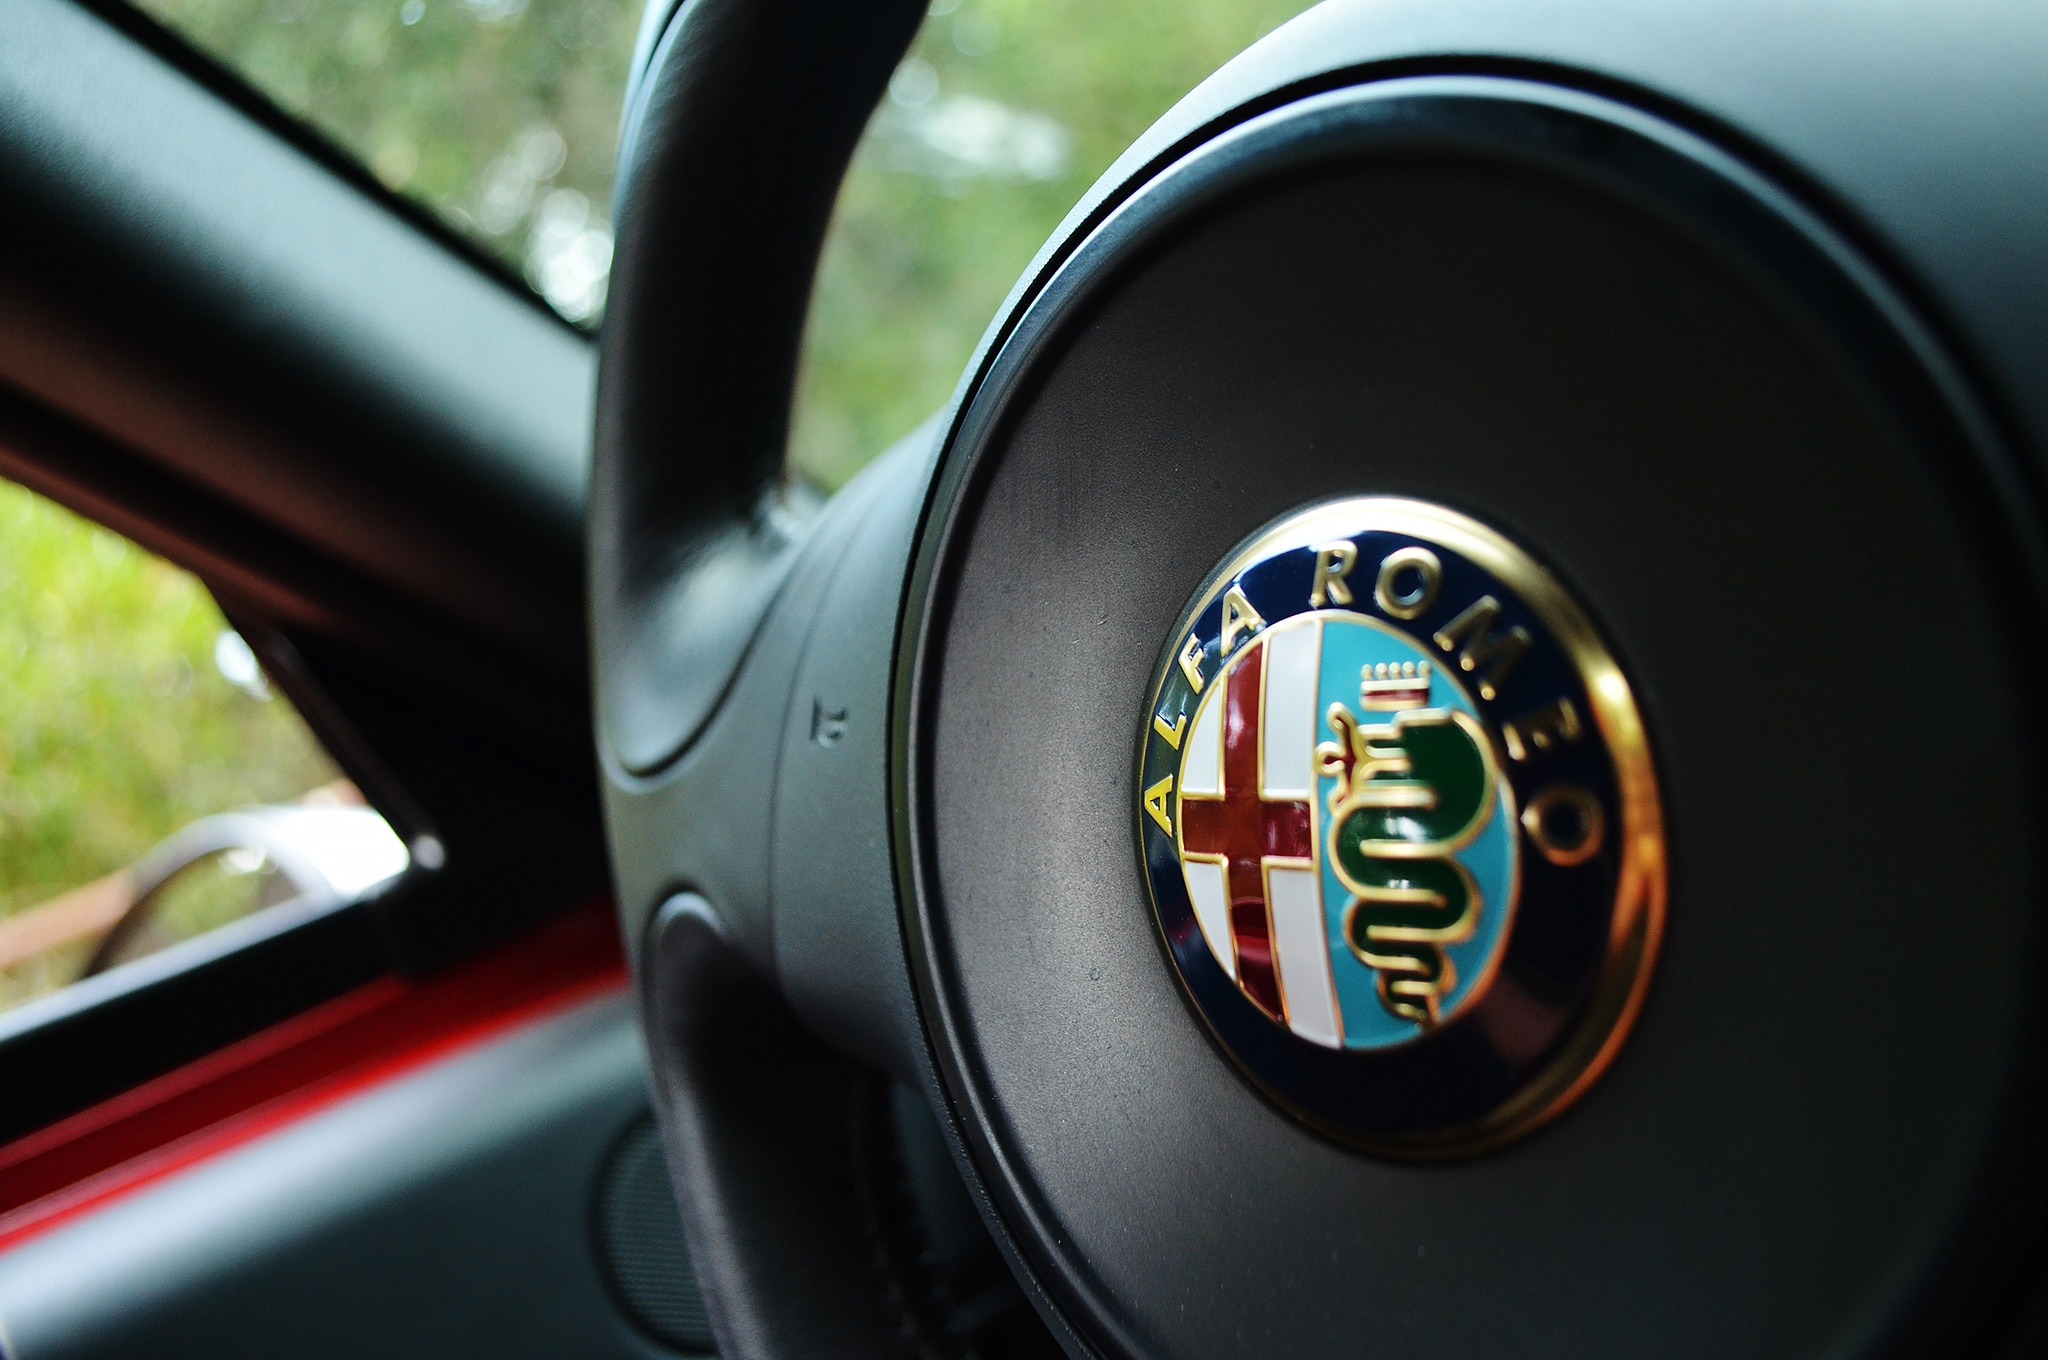 alfa romeo logo 2015. 2015 alfa romeo 4c steering wheel logo